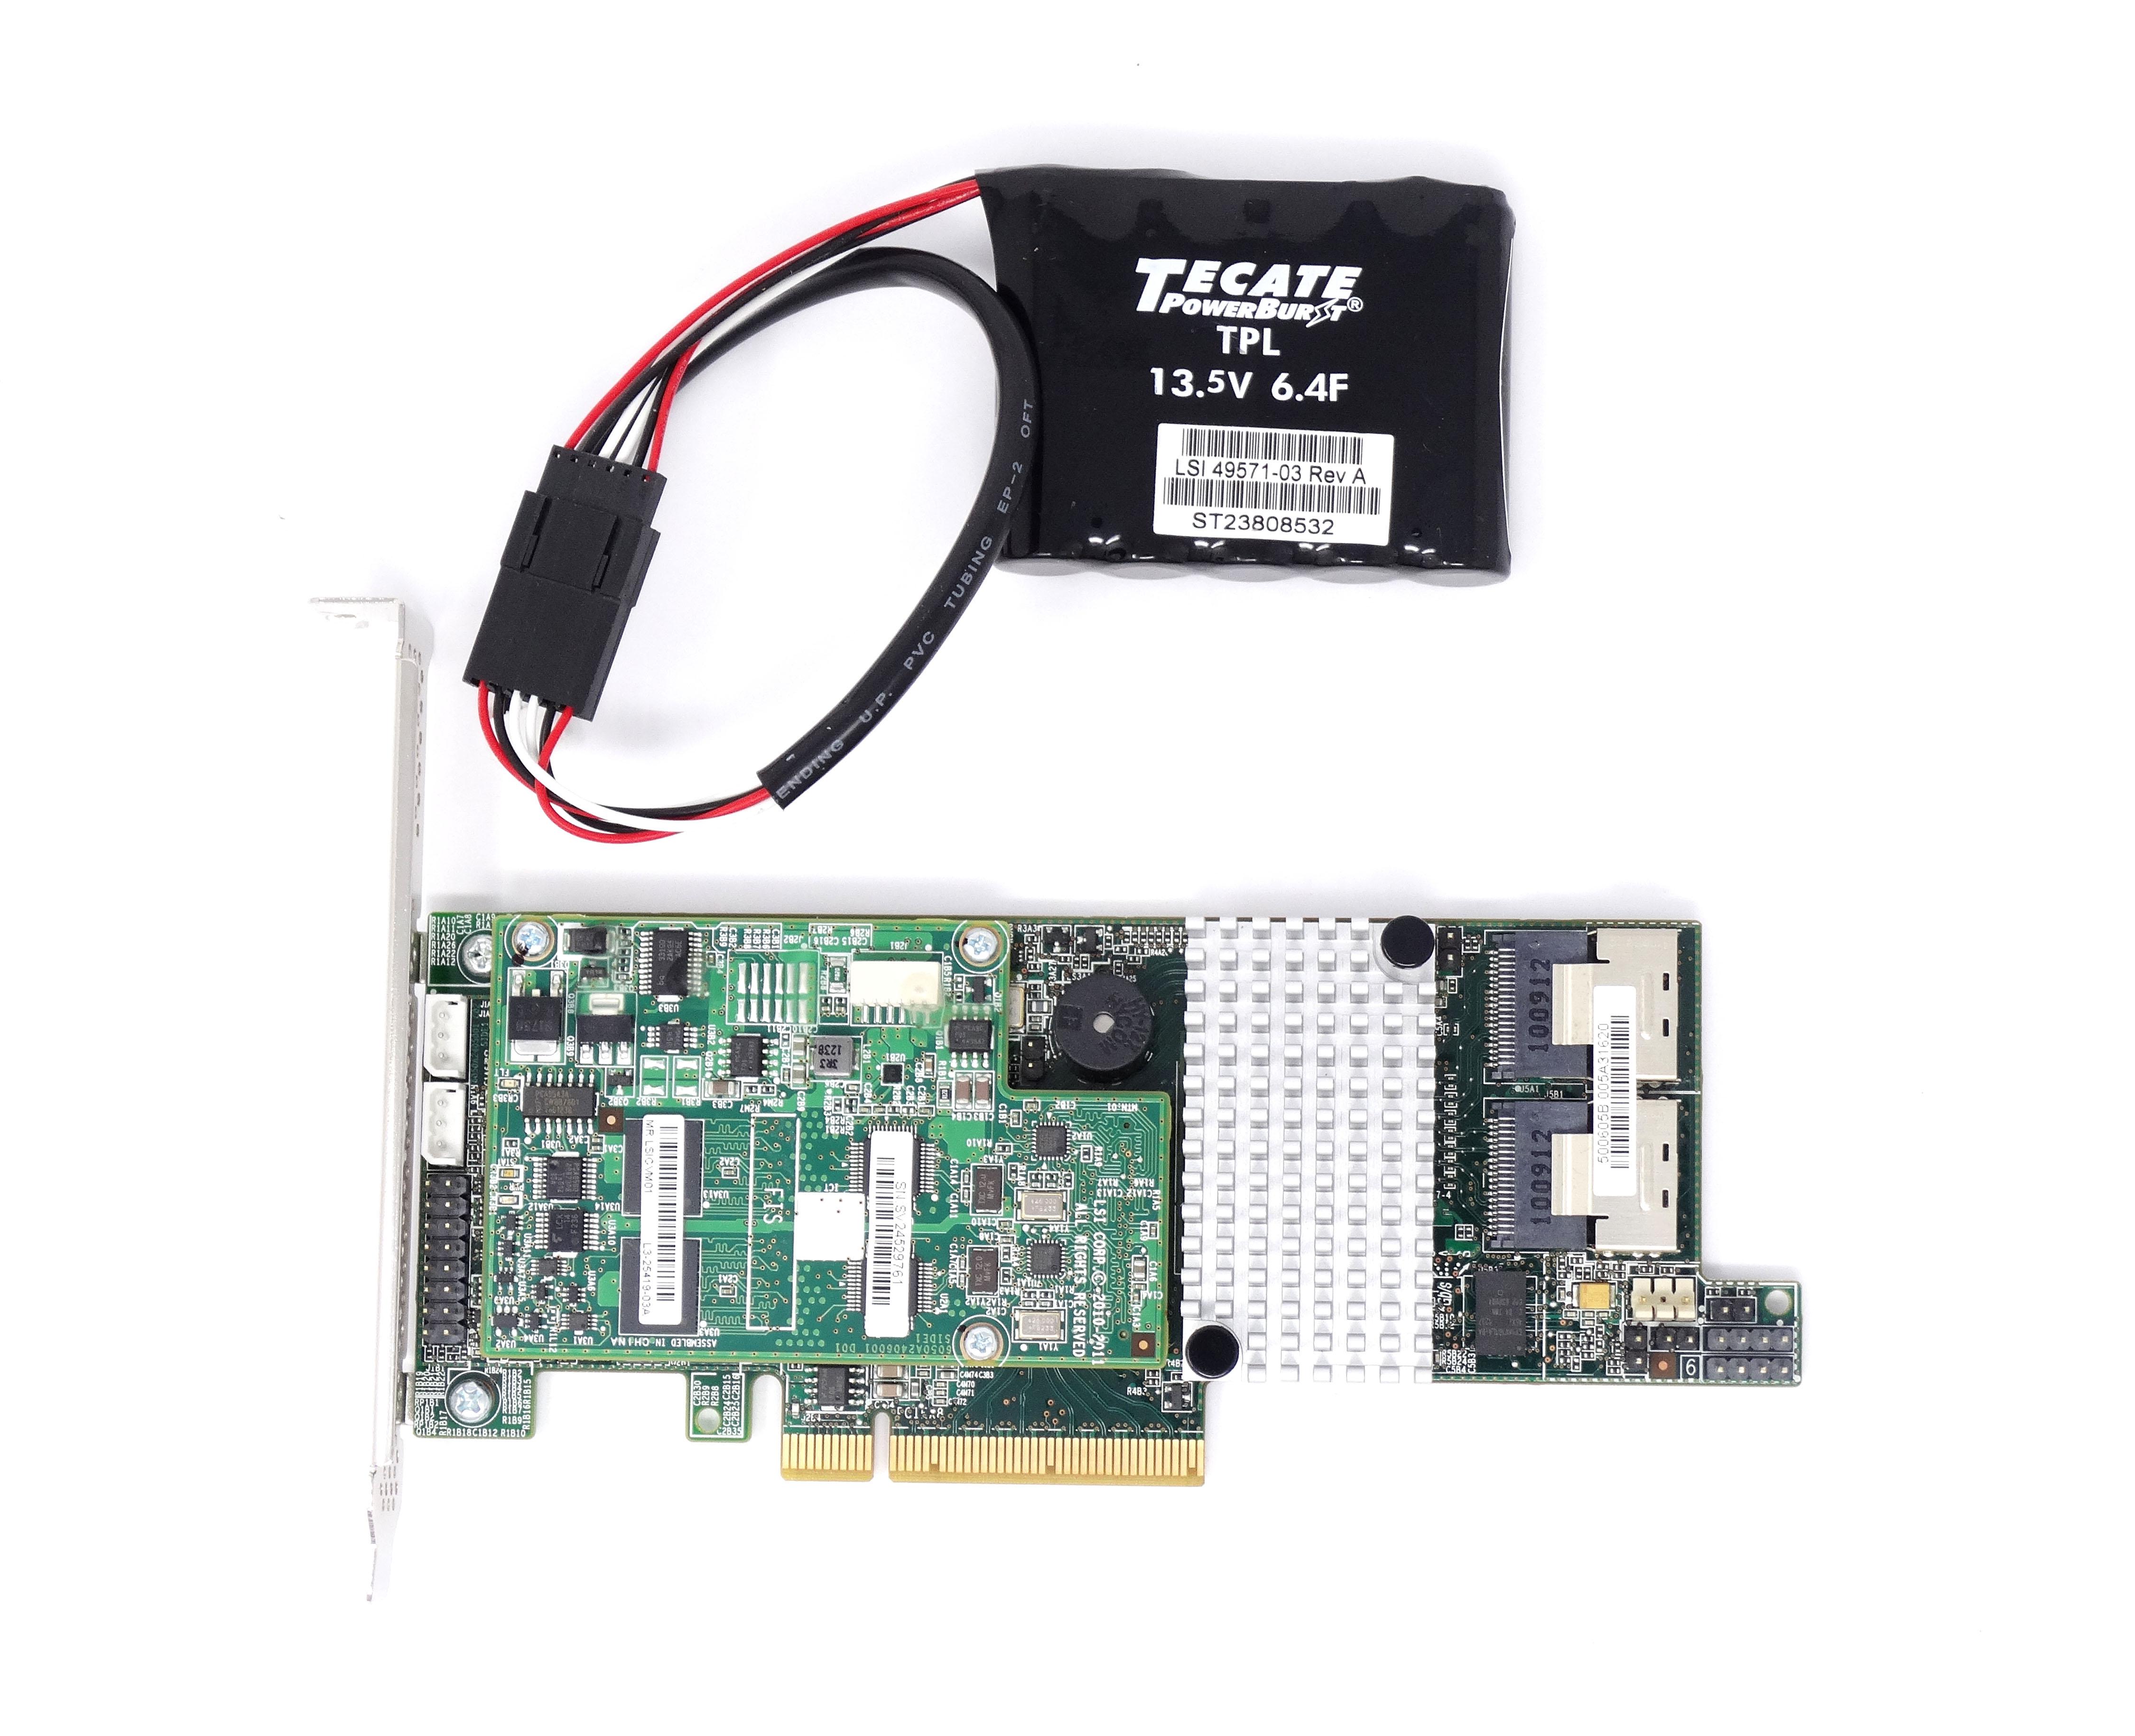 LSI MR 9266-8i SAS SATA 1GB PCIe RAID Controller (L3-25413-17A)